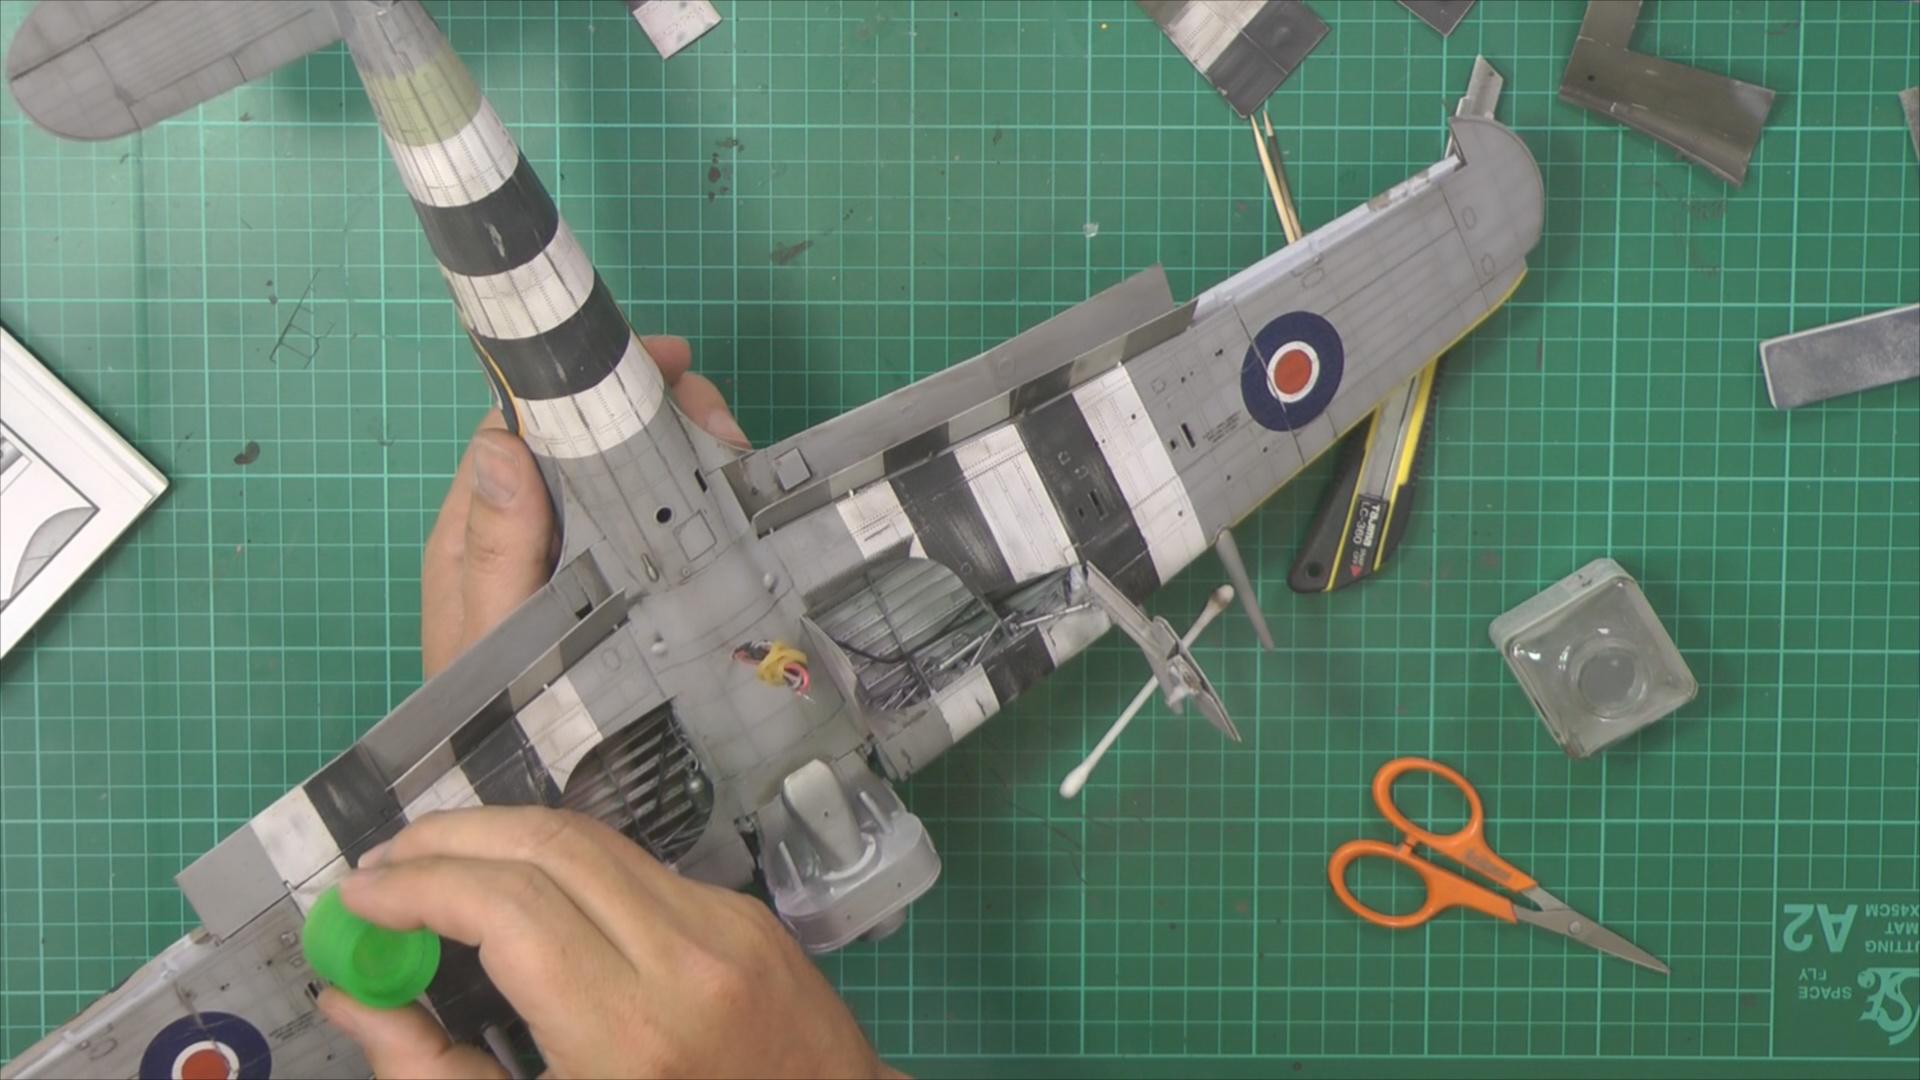 Hawker+Typhoon+Part+12+Pic+2.jpg